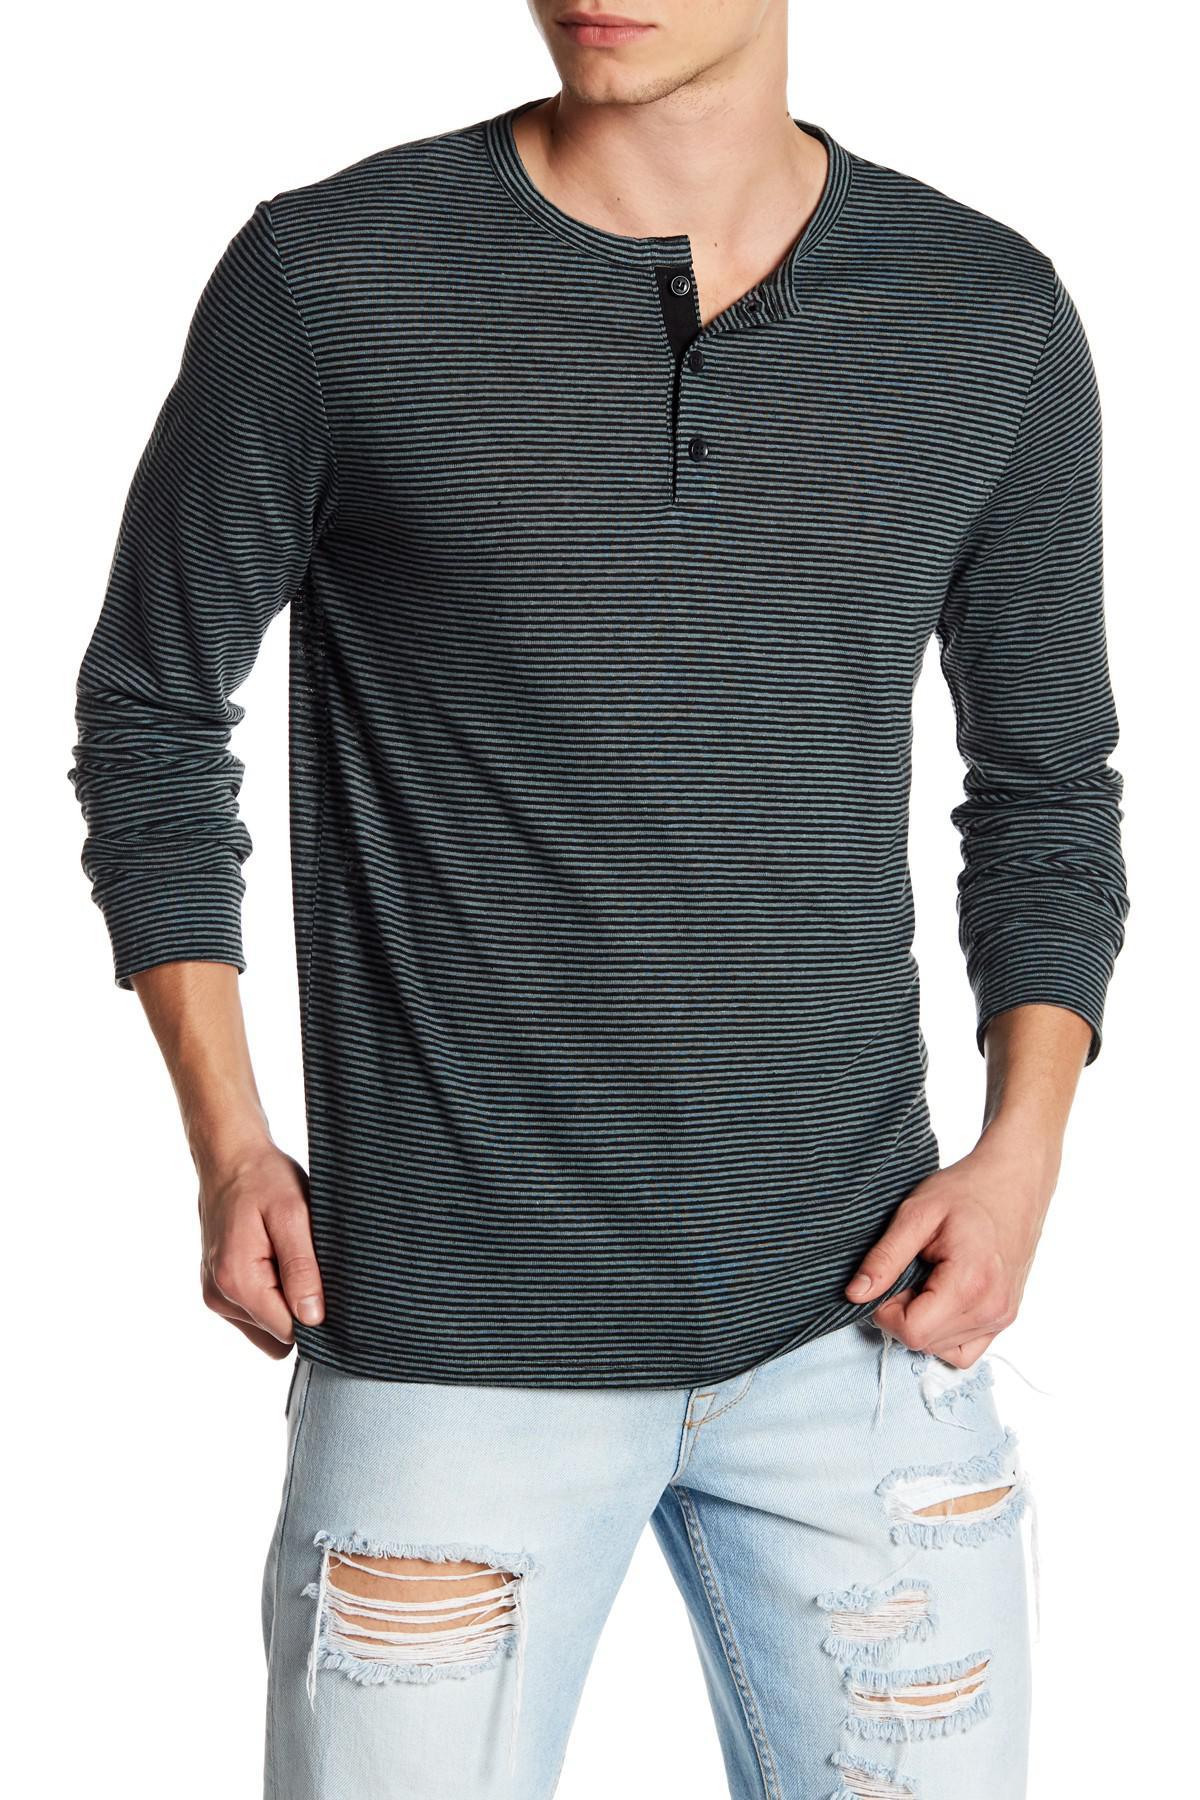 Onia miles long sleeve stripe henley shirt in black for for Black long sleeve henley shirt